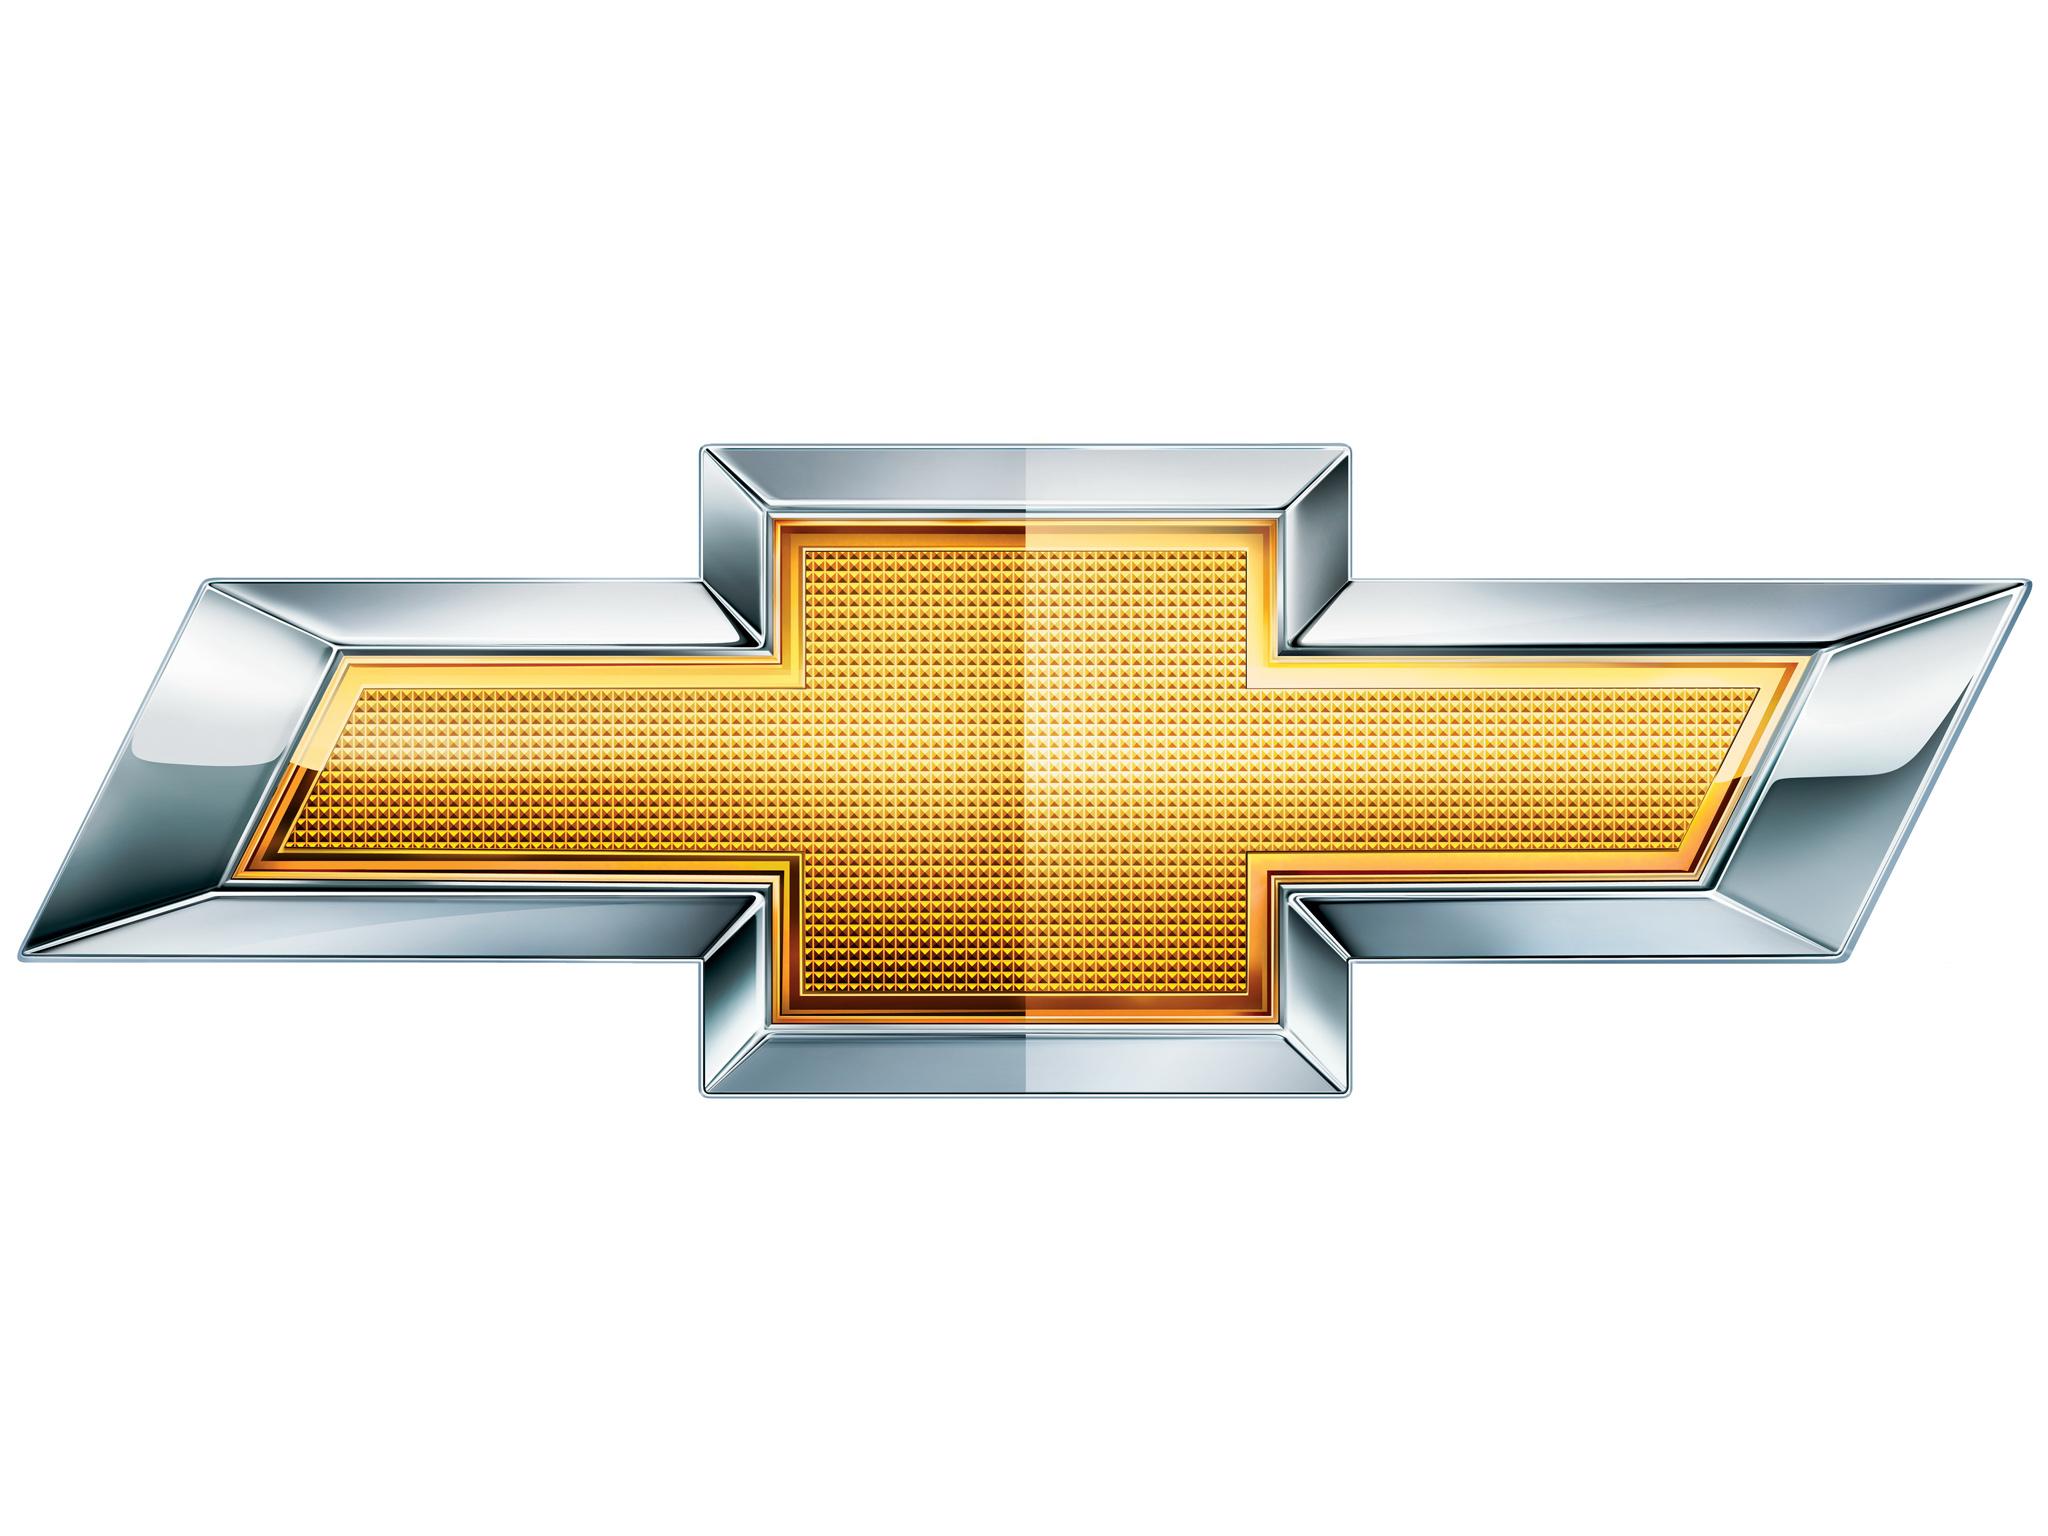 Chevrolet Wallpapers Chevrolet Logo Wallpapers 2048x1536